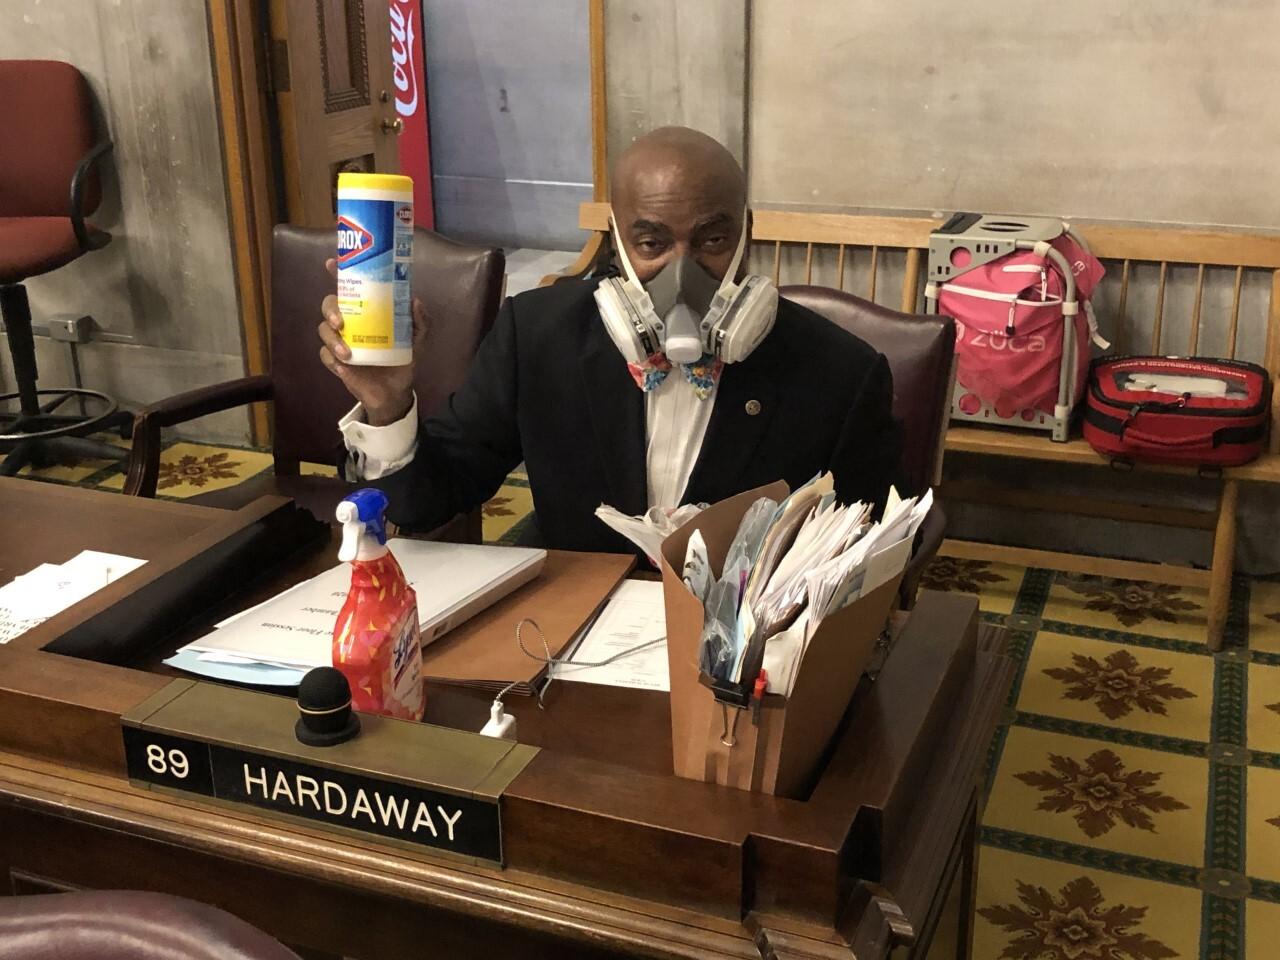 GA Hardaway Mask.jpg